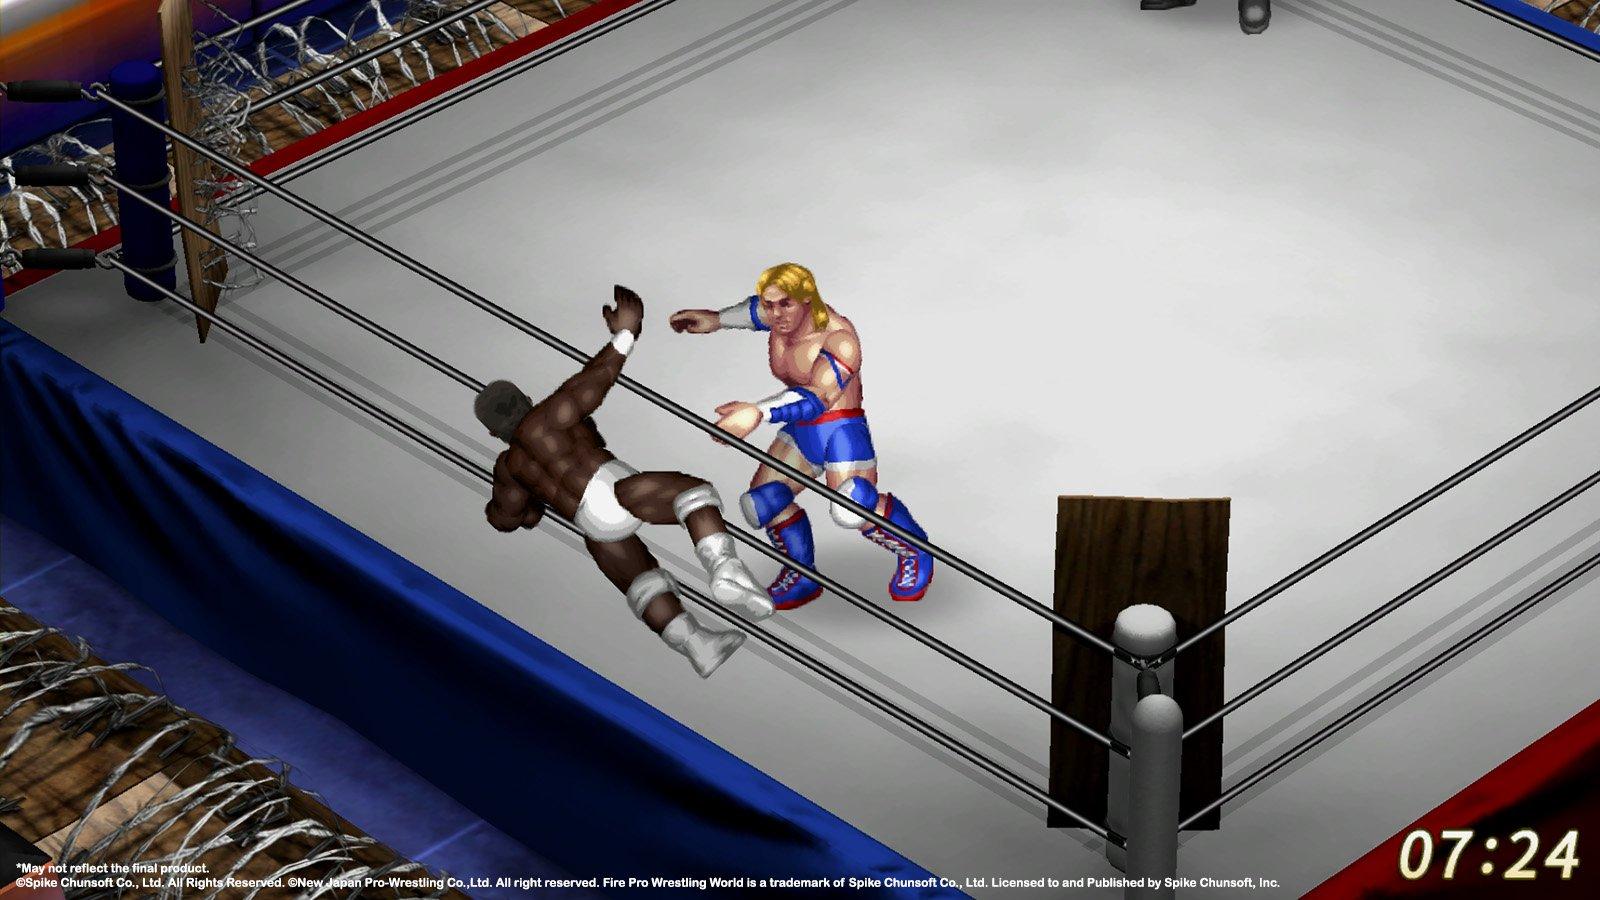 Fire-Pro-Wrestling-World_2018_03-23-18_003